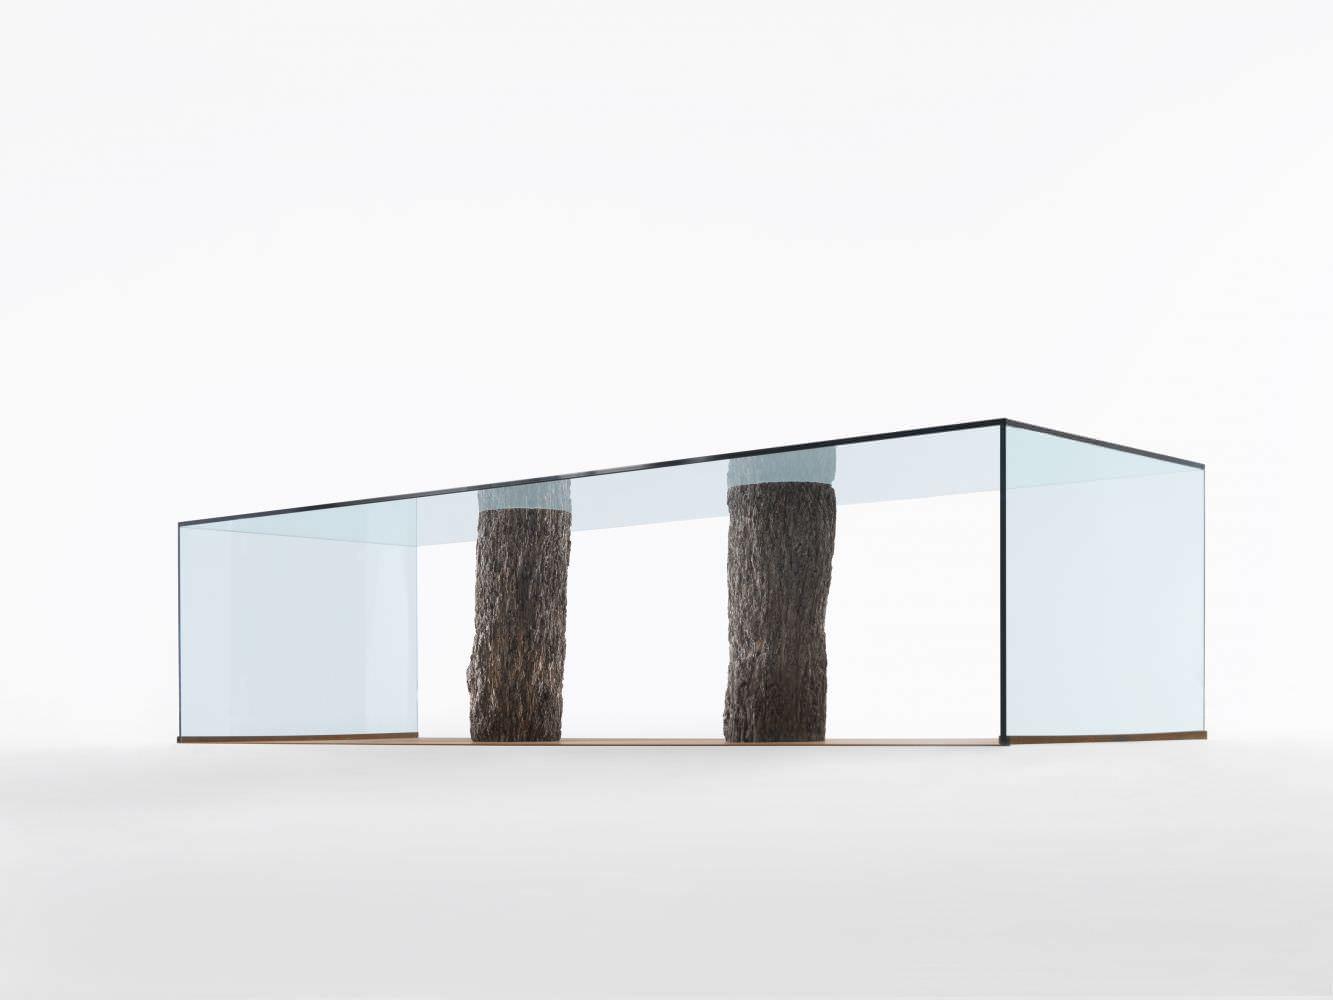 ... Moderne Tisch / Holz / Glas / Rechteckig LAGUNA By Paolo Piva Riva  Industria Mobili ...